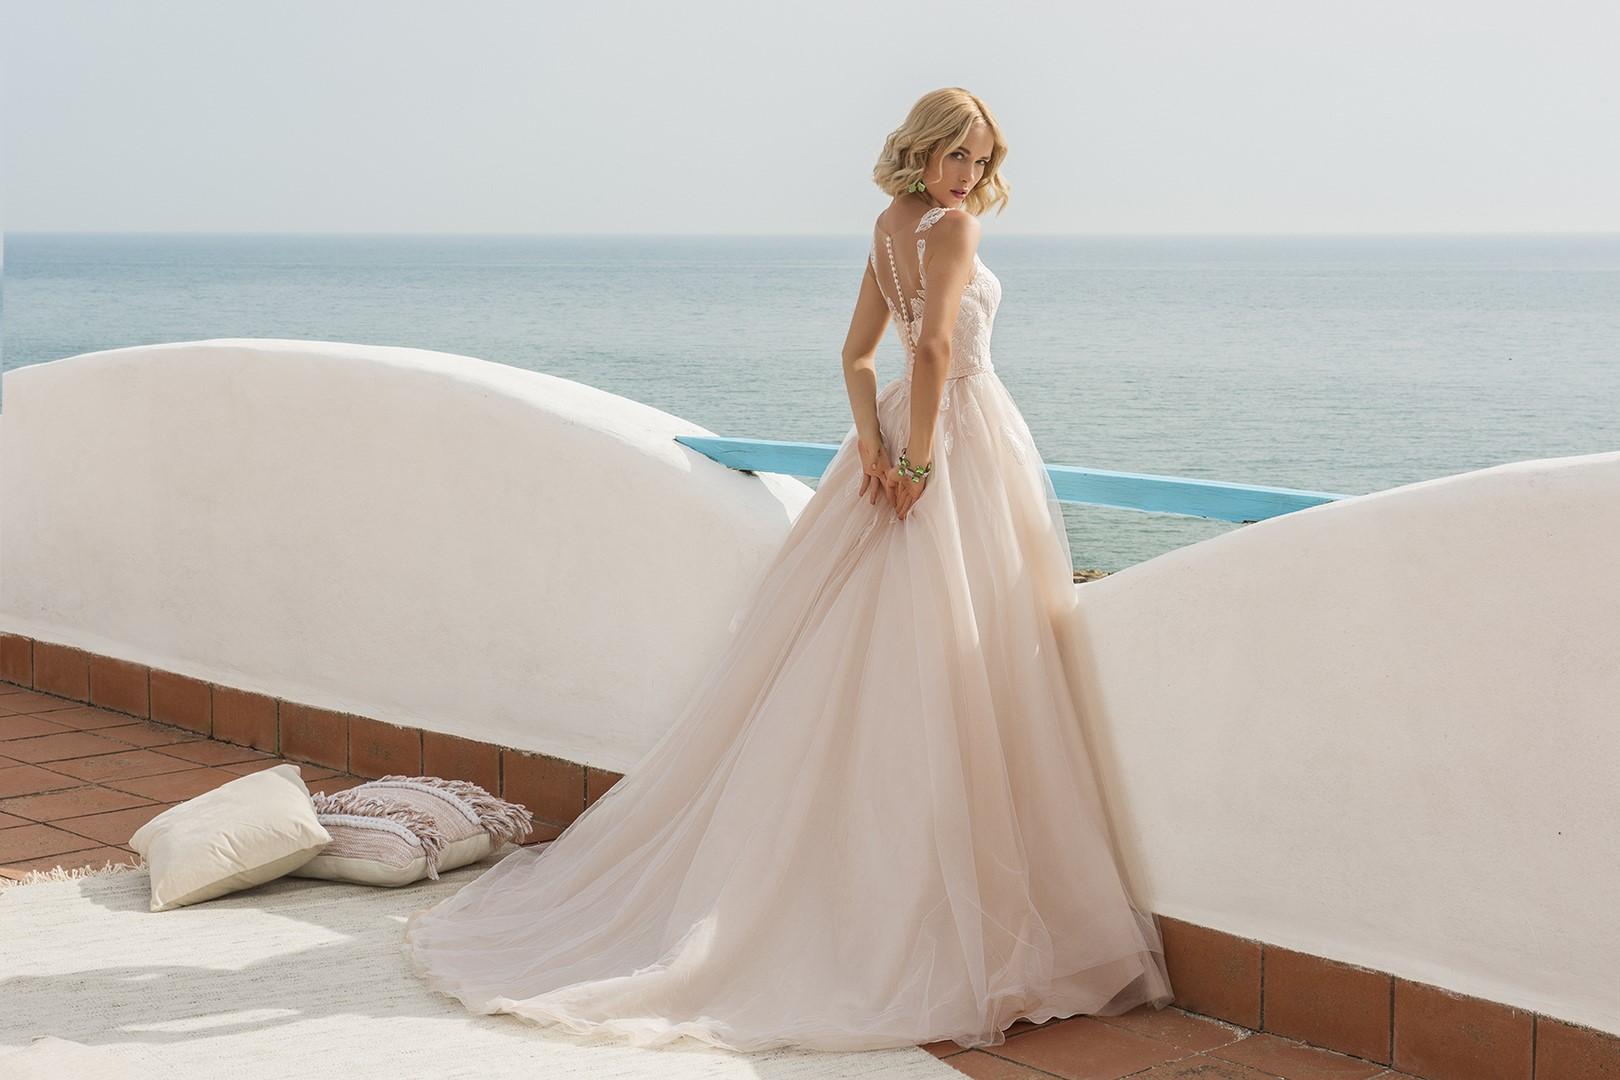 Anastasia-Jillian Elianto-0976-WEB Jillian Abiti da sposa Collezione 2020.jpg